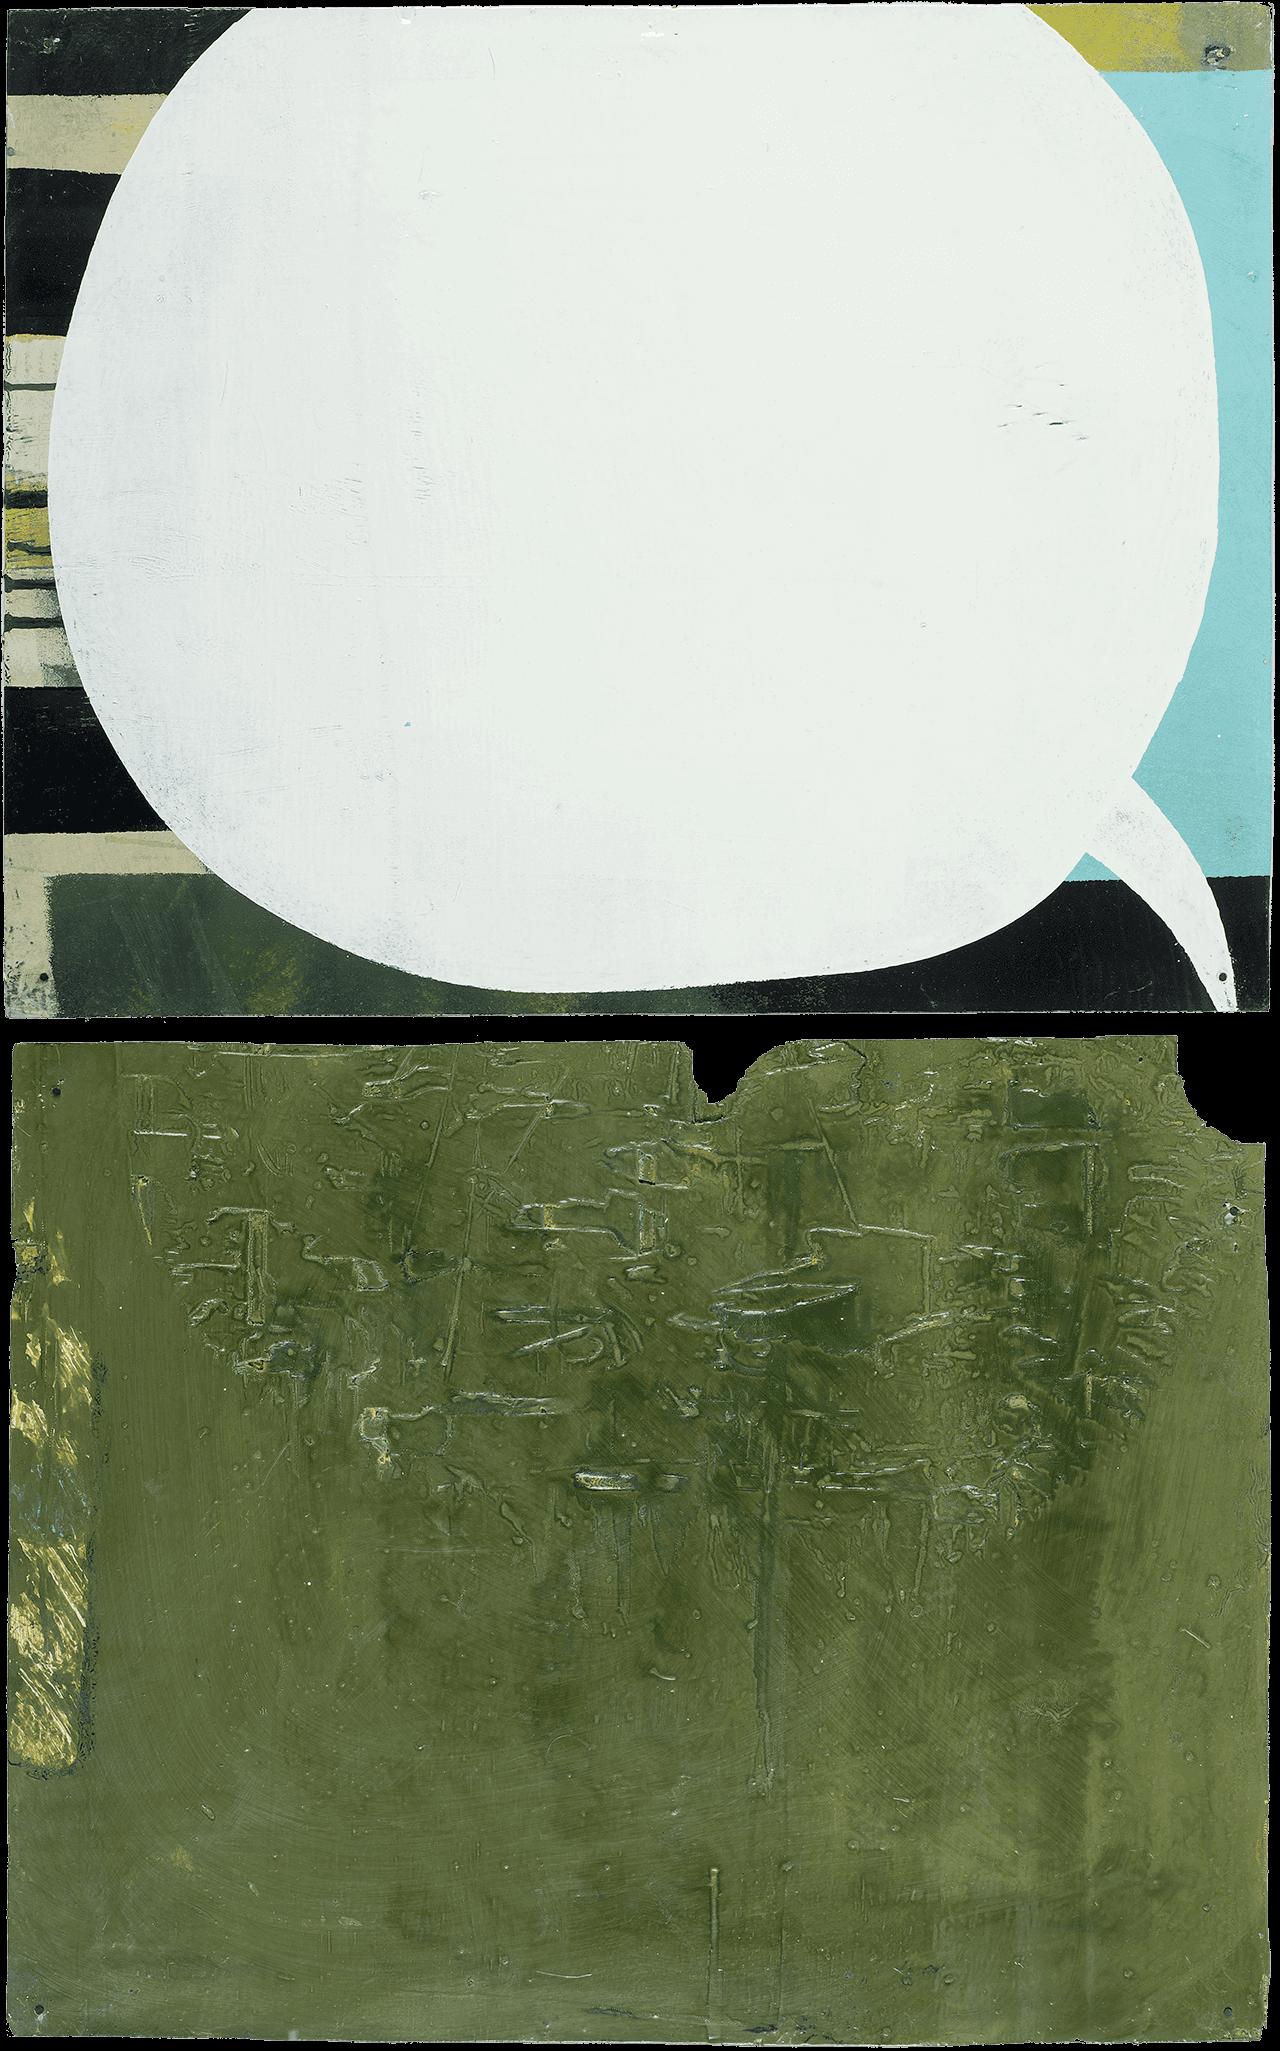 Bubble in the 'Listening Room', 2017, λαδομπογιά σε ξύλινα πάνελ, 40x50 εκ. το καθένα.